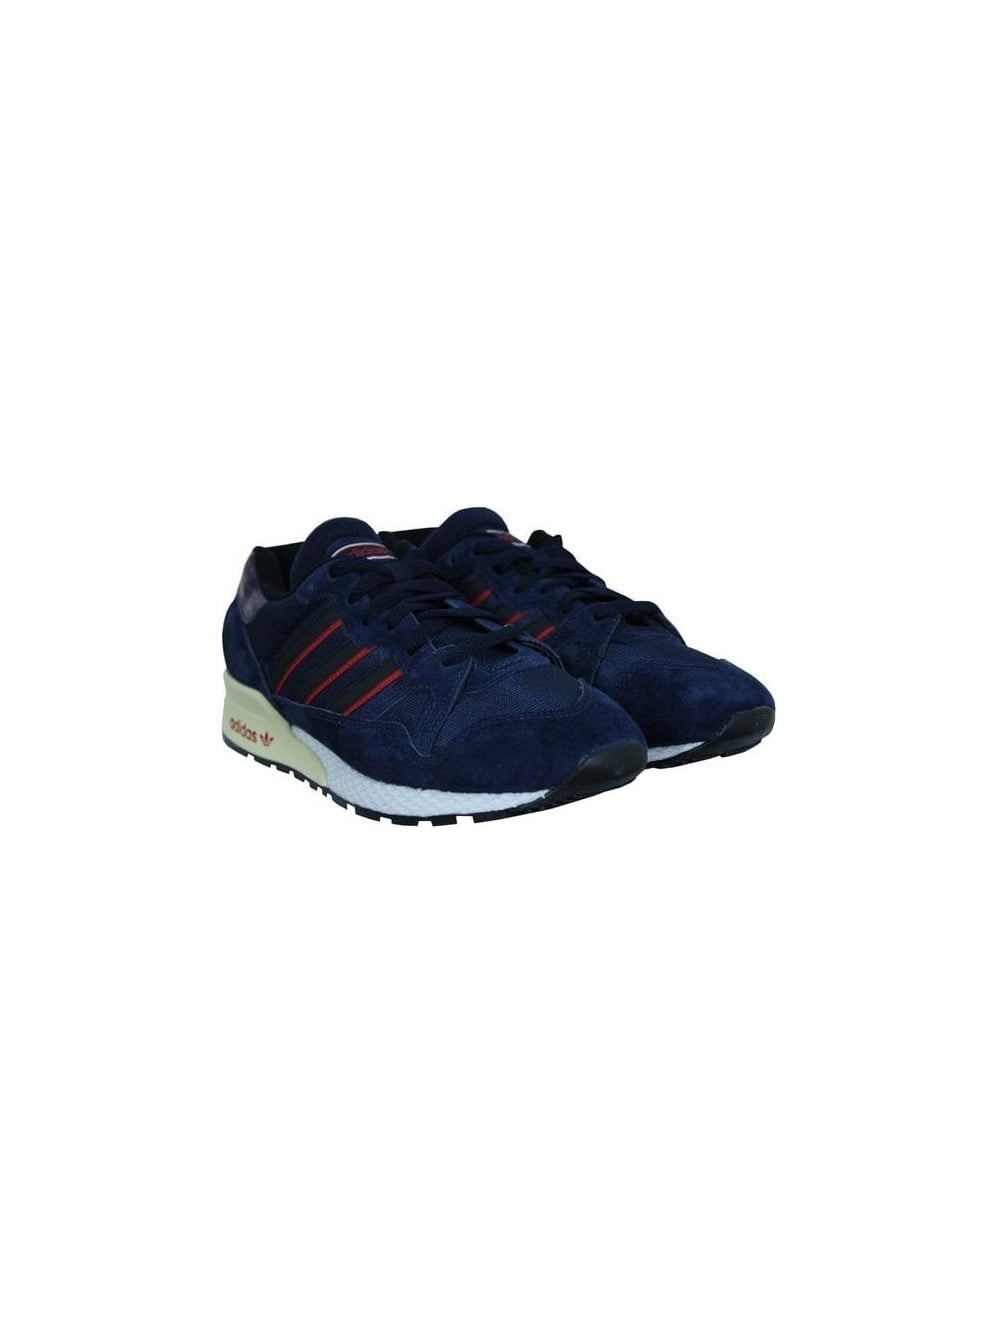 8a2b77507ab0 Adidas Originals ZX710 in New Navy - Northern Threads